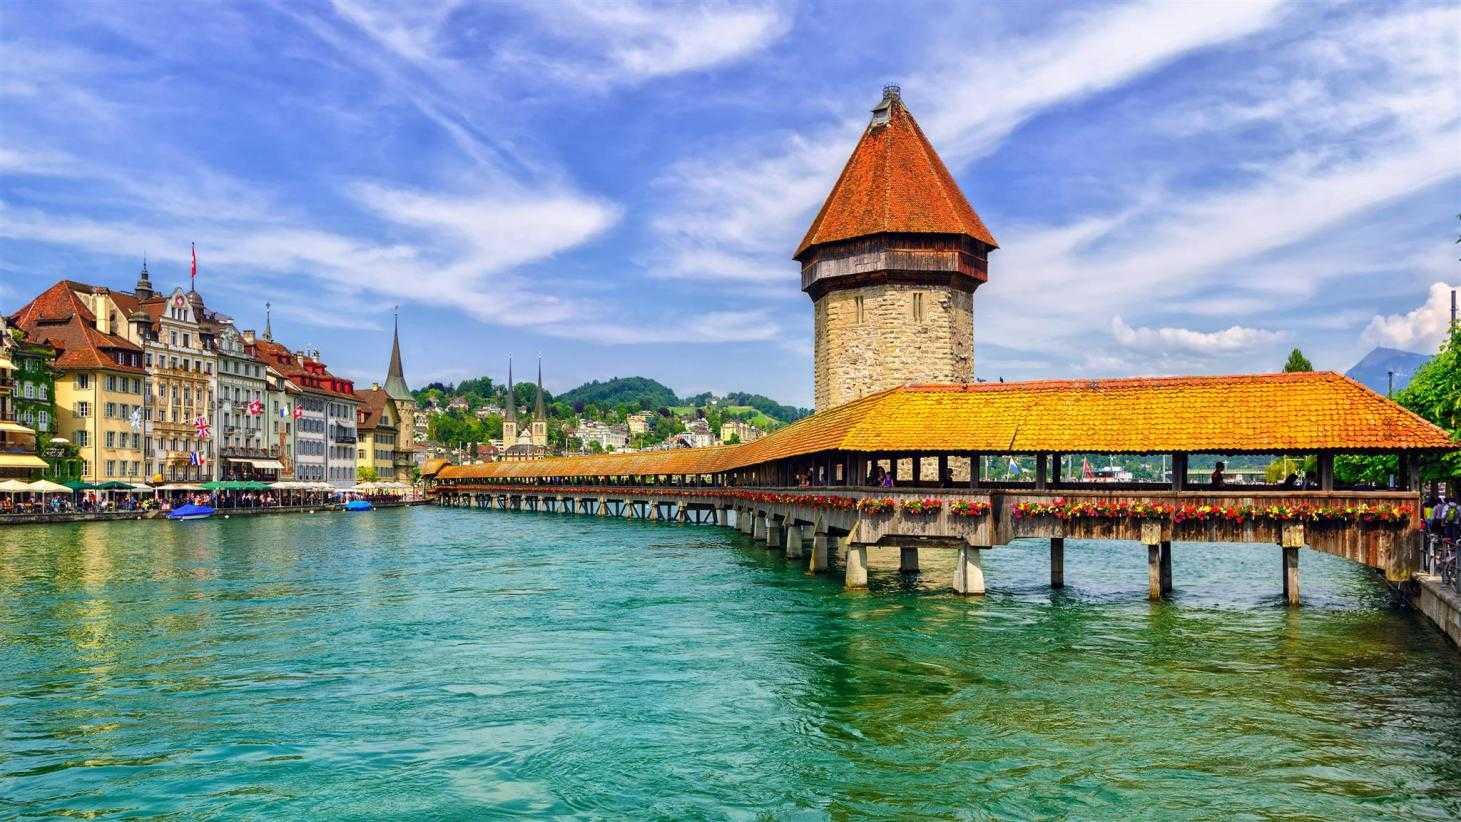 Vùng hồ Lucerne